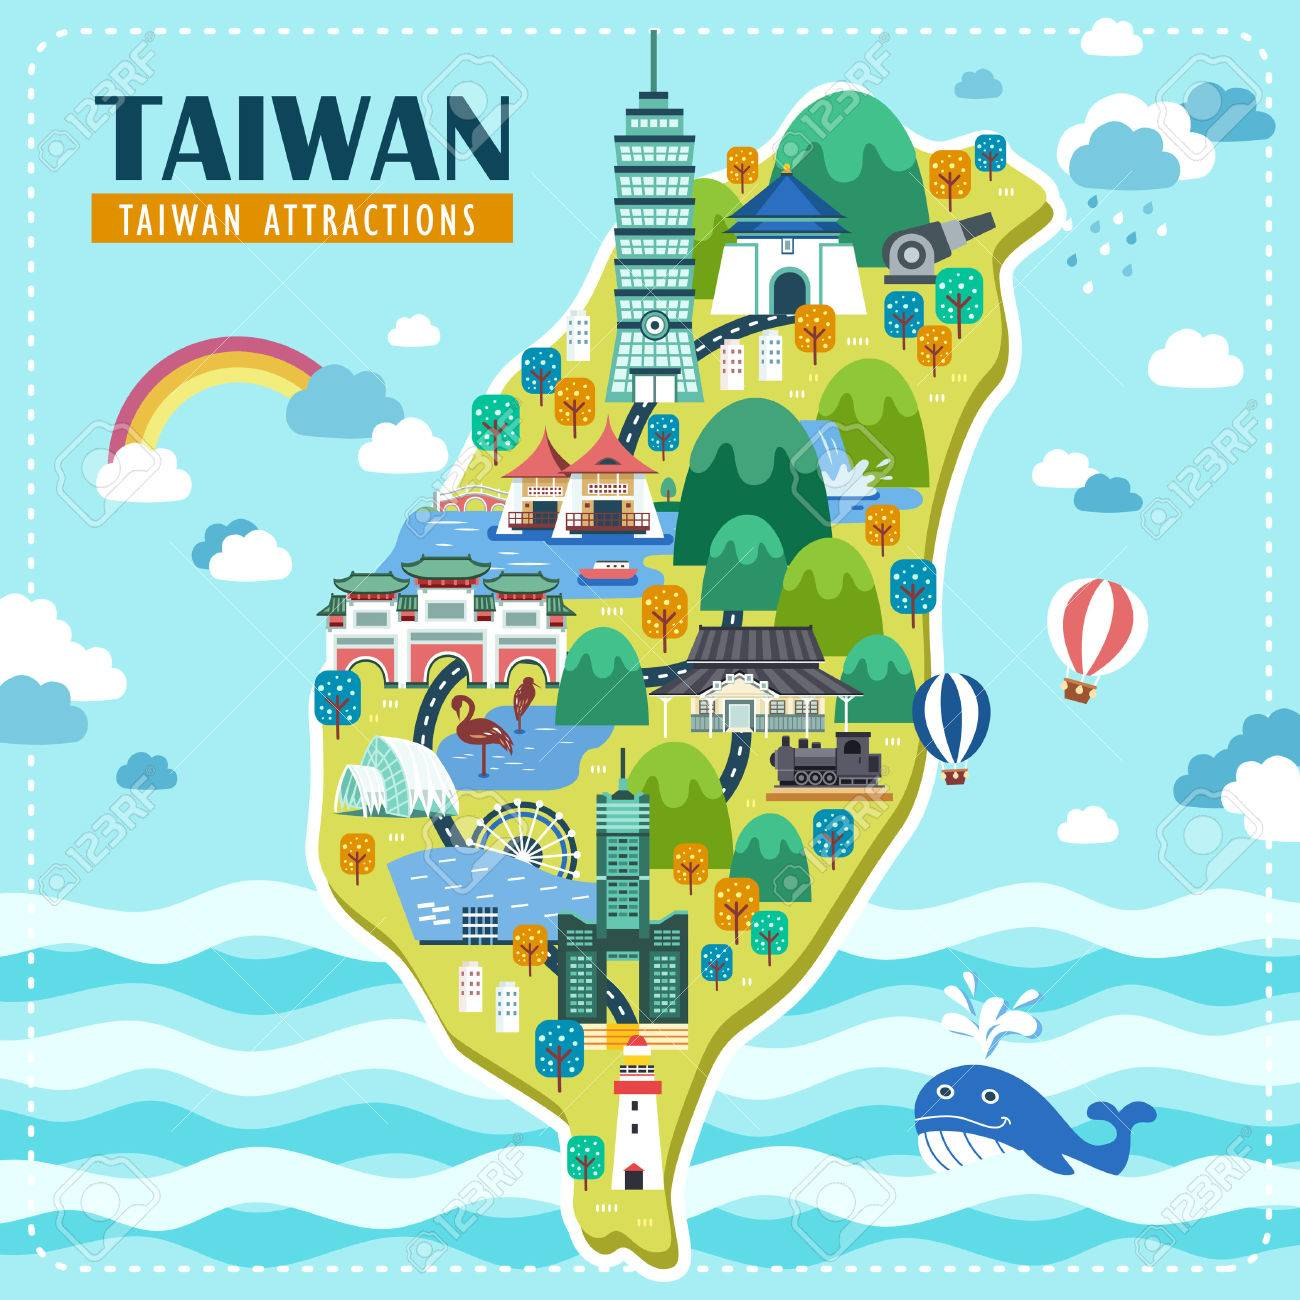 「taiwan map」的圖片搜尋結果